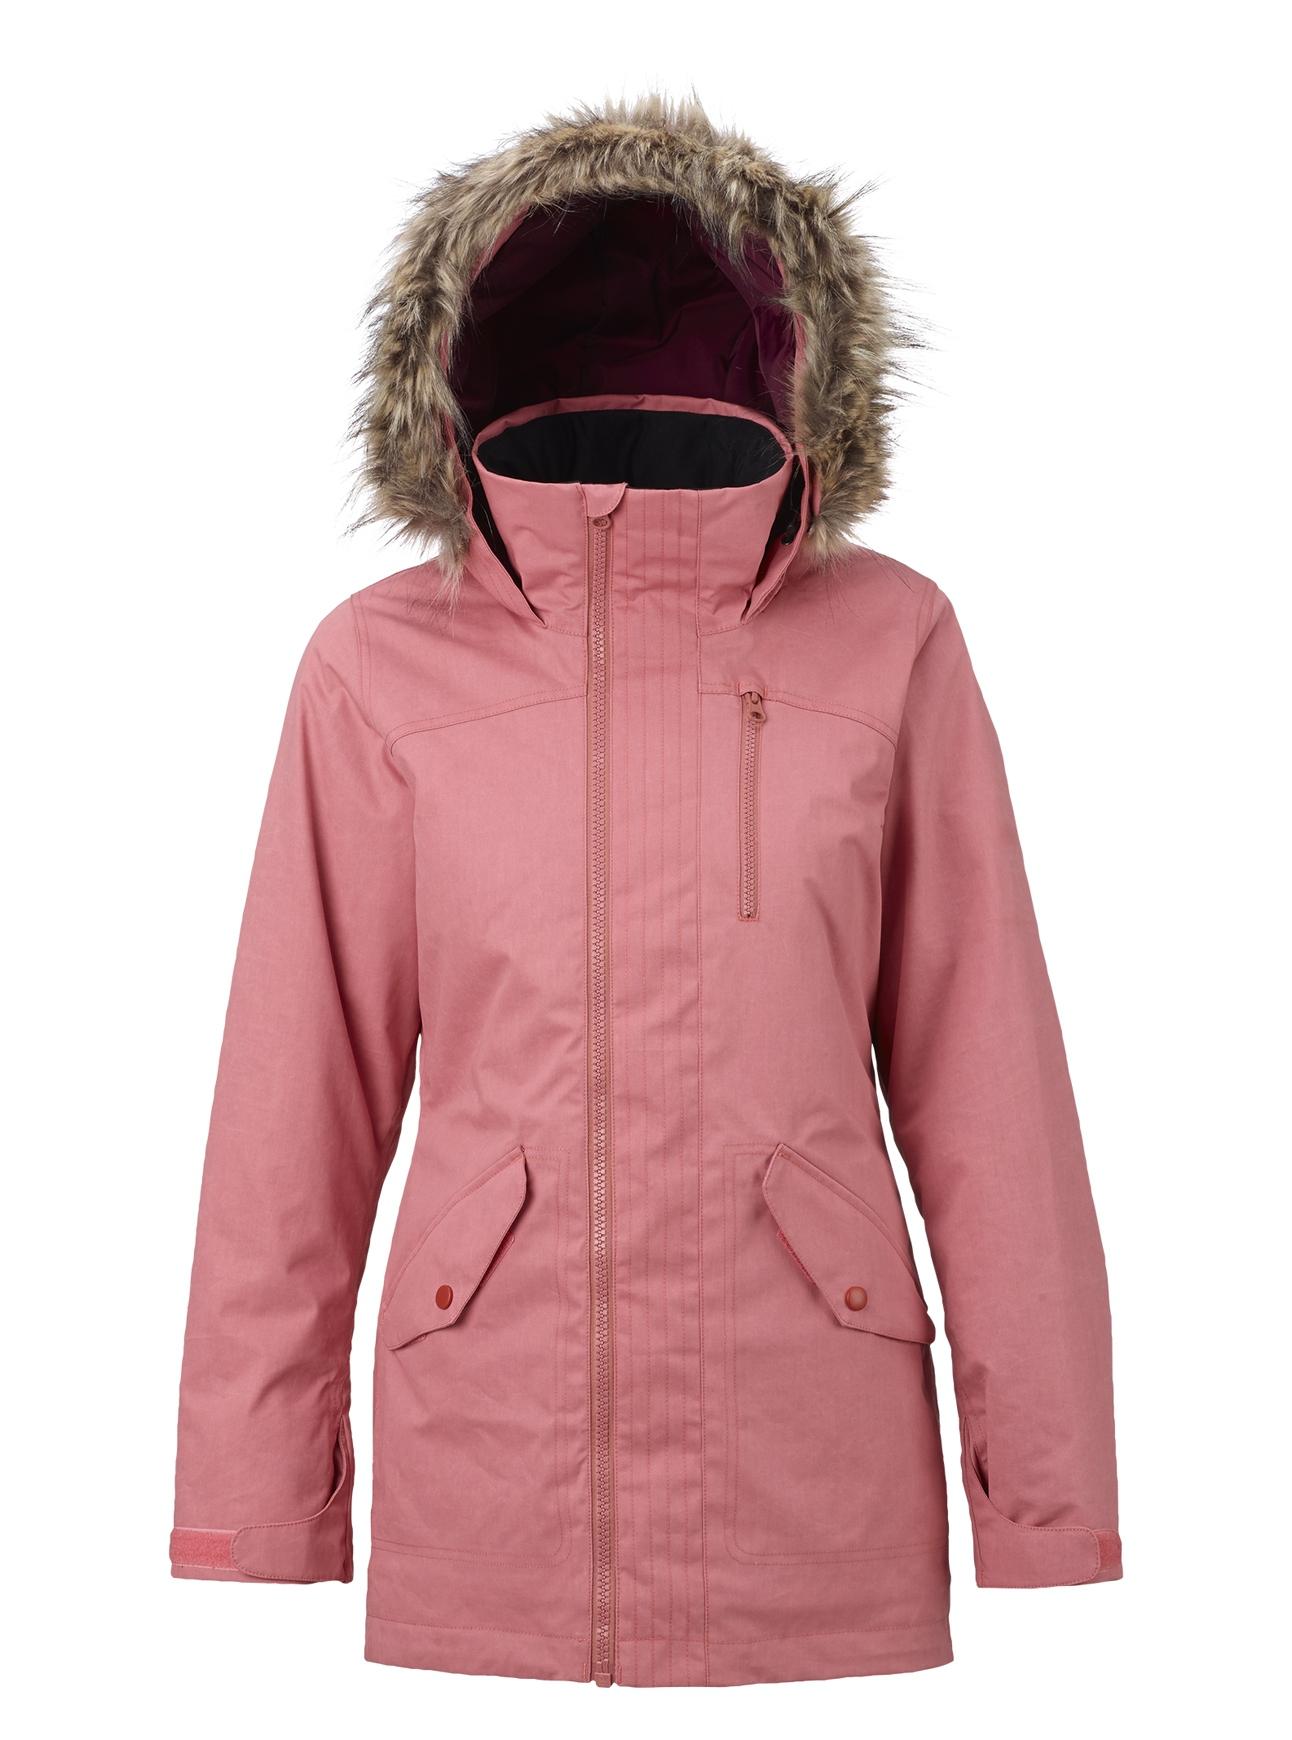 Jacket Hazel Wax Wb Dusty Rose Snowleader Ski Vestes Burton v5wqZpnAfq